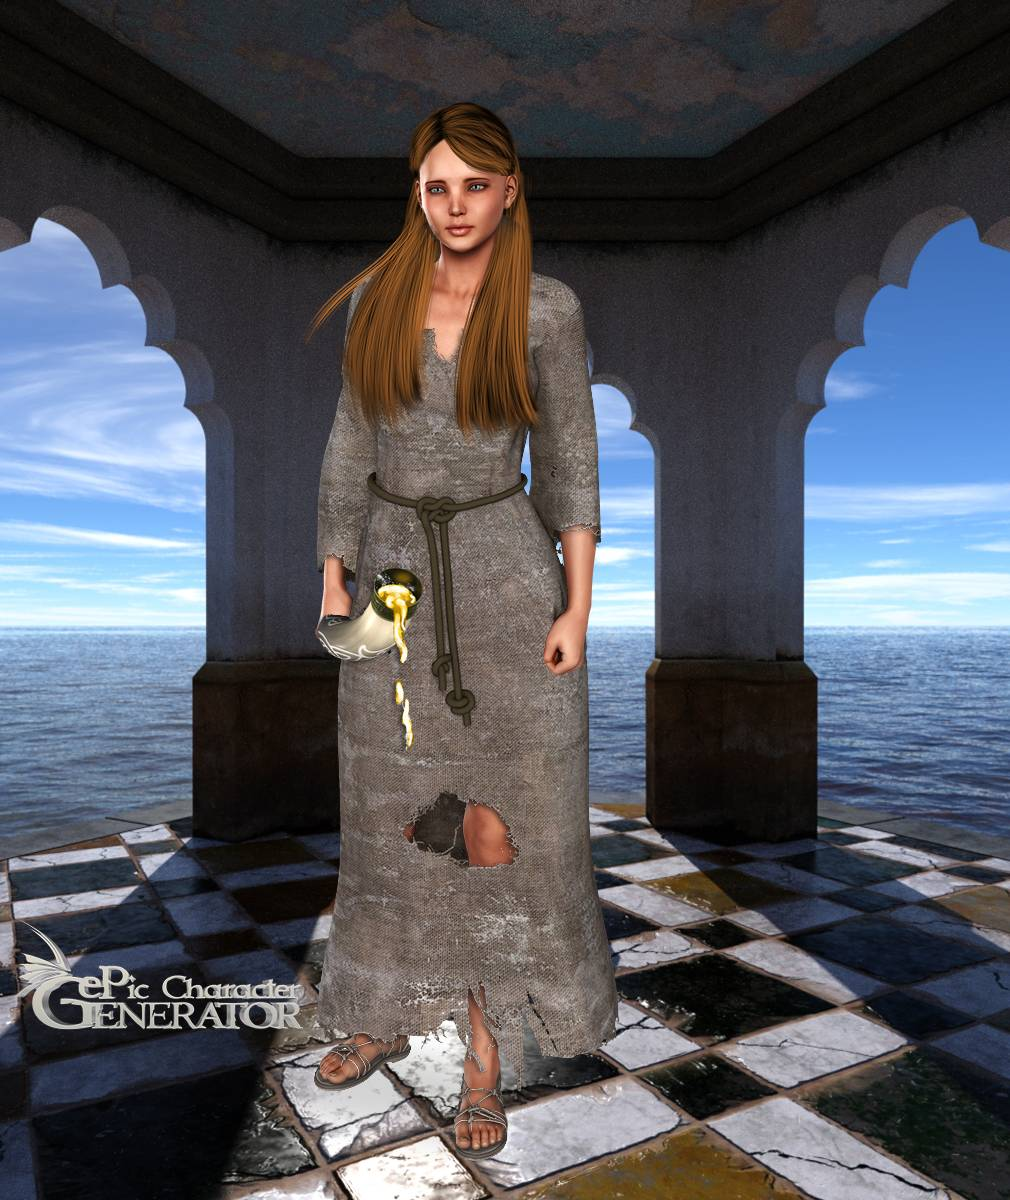 ePic Character Generator Season 2 Female Adventurer 2 Screenshot 04